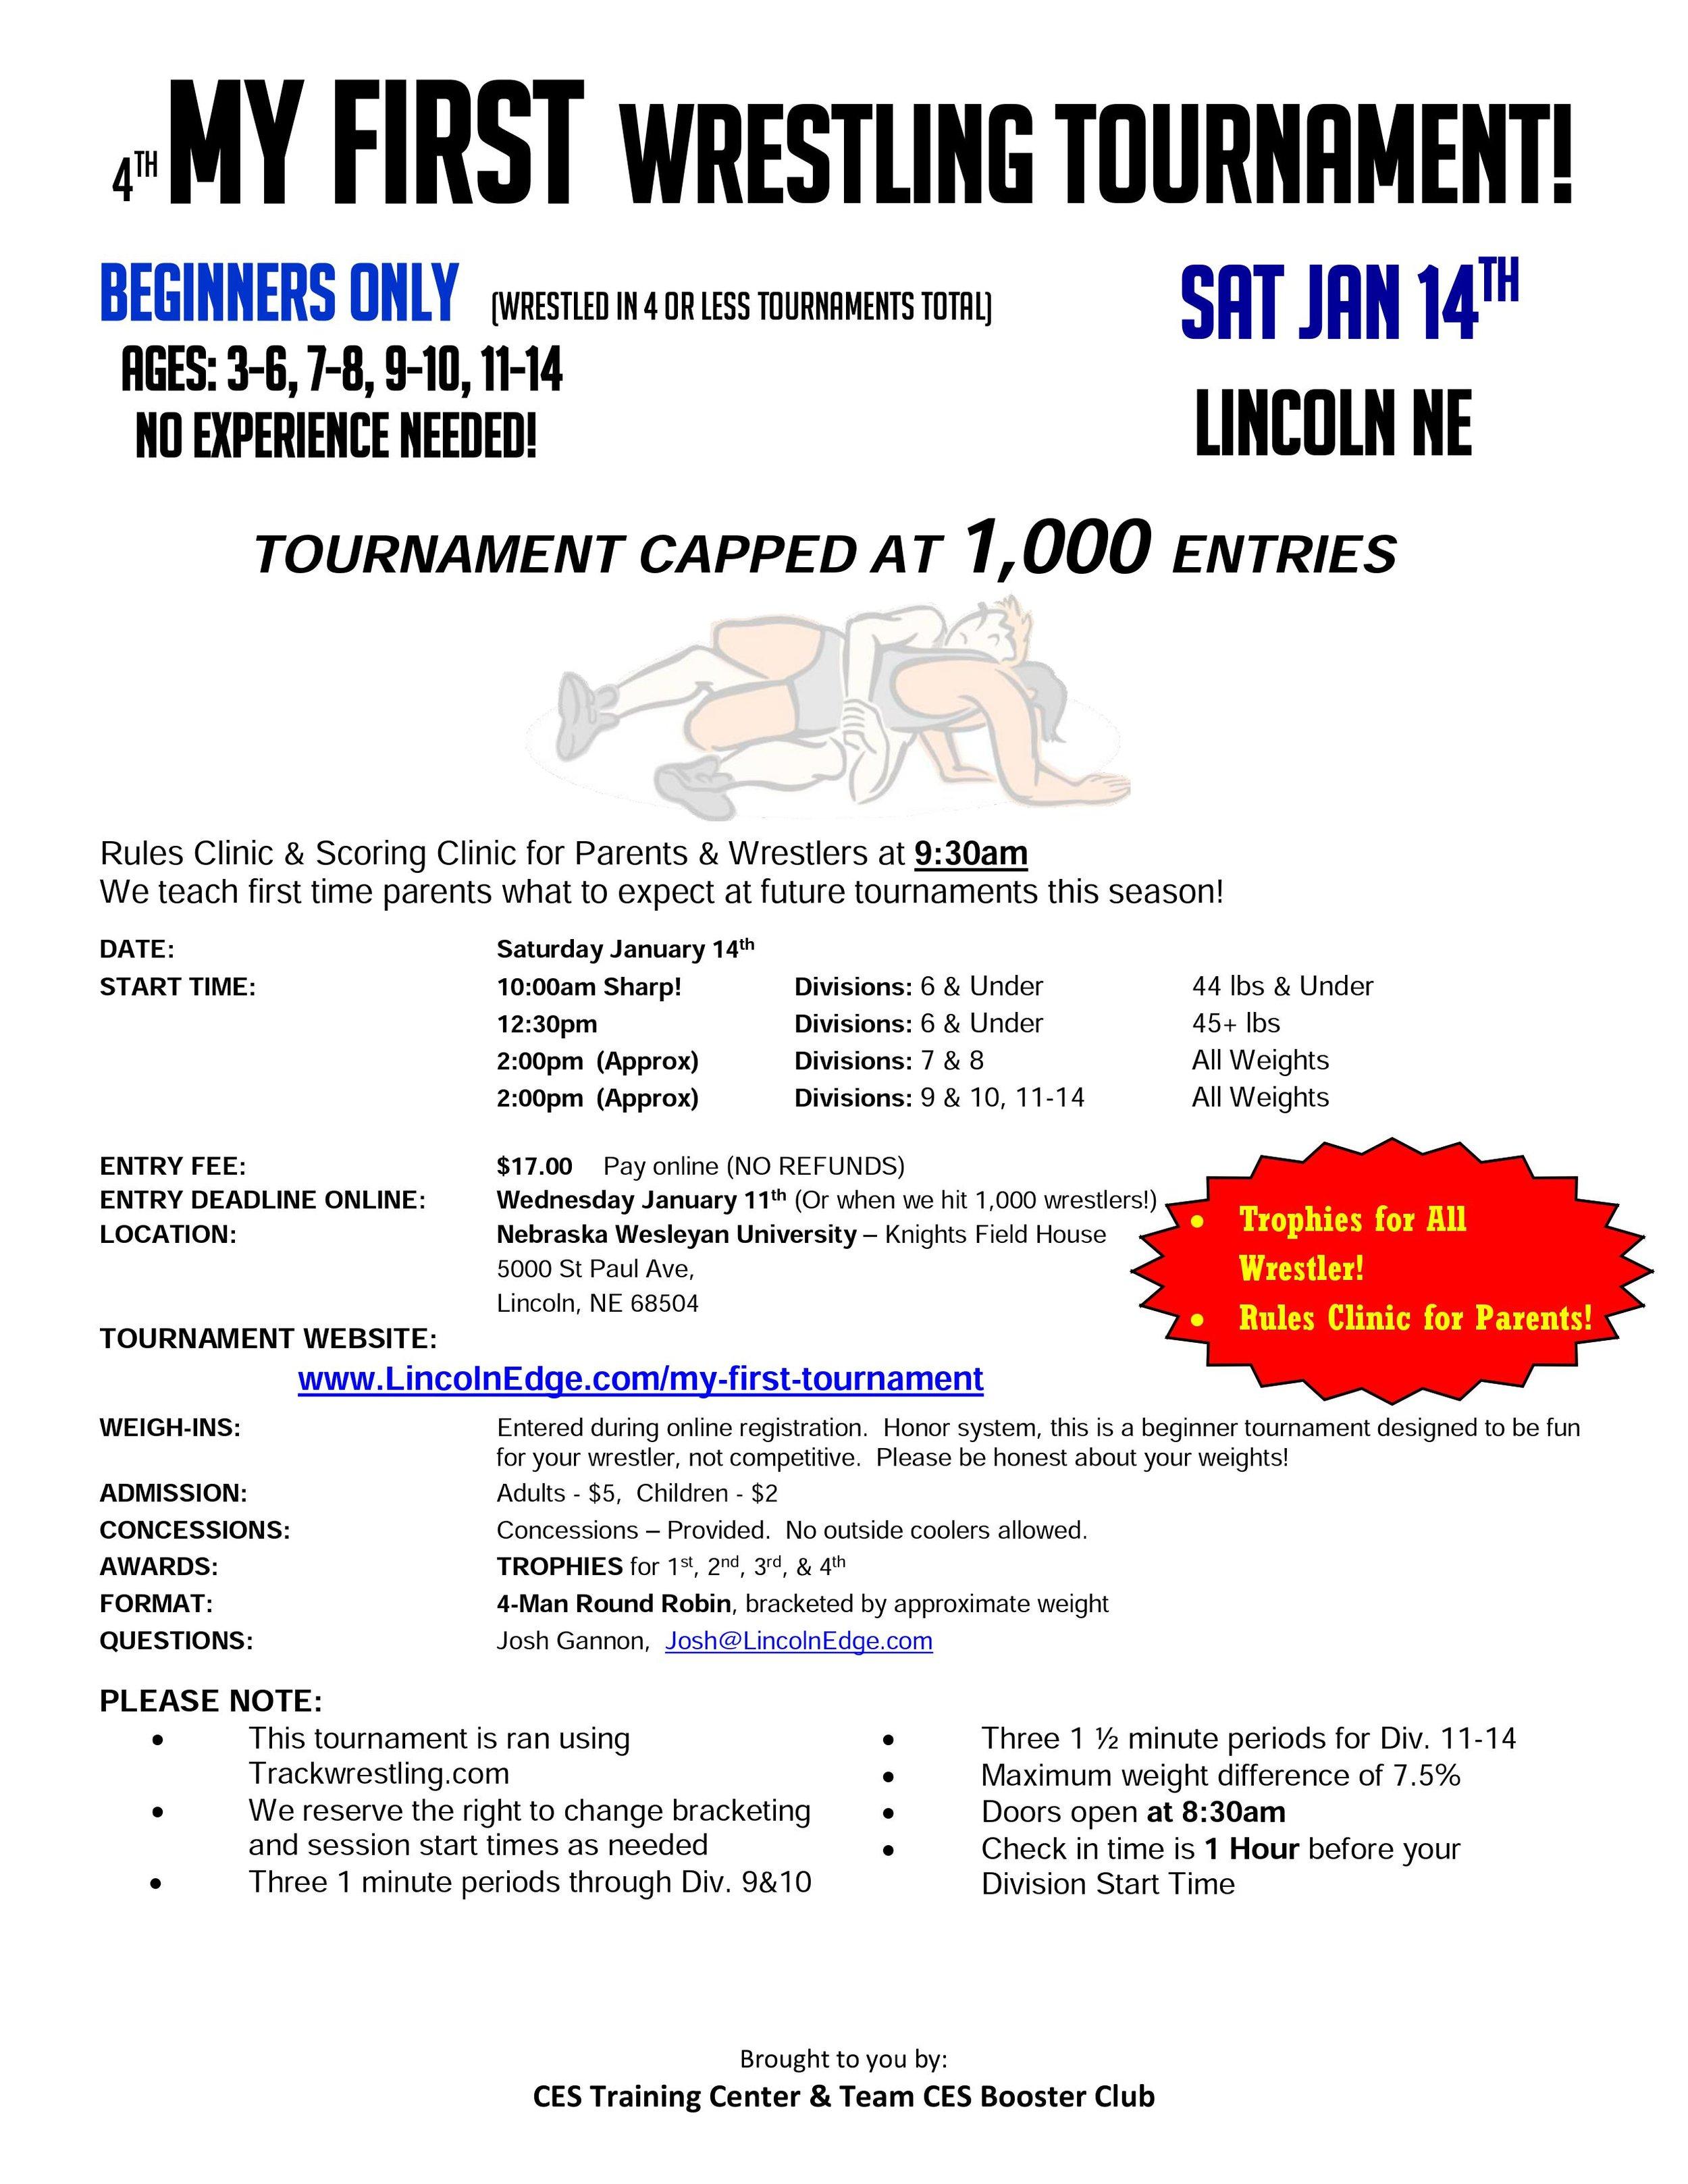 Info Flier - My First Wrestling Tournament! 2017.jpg